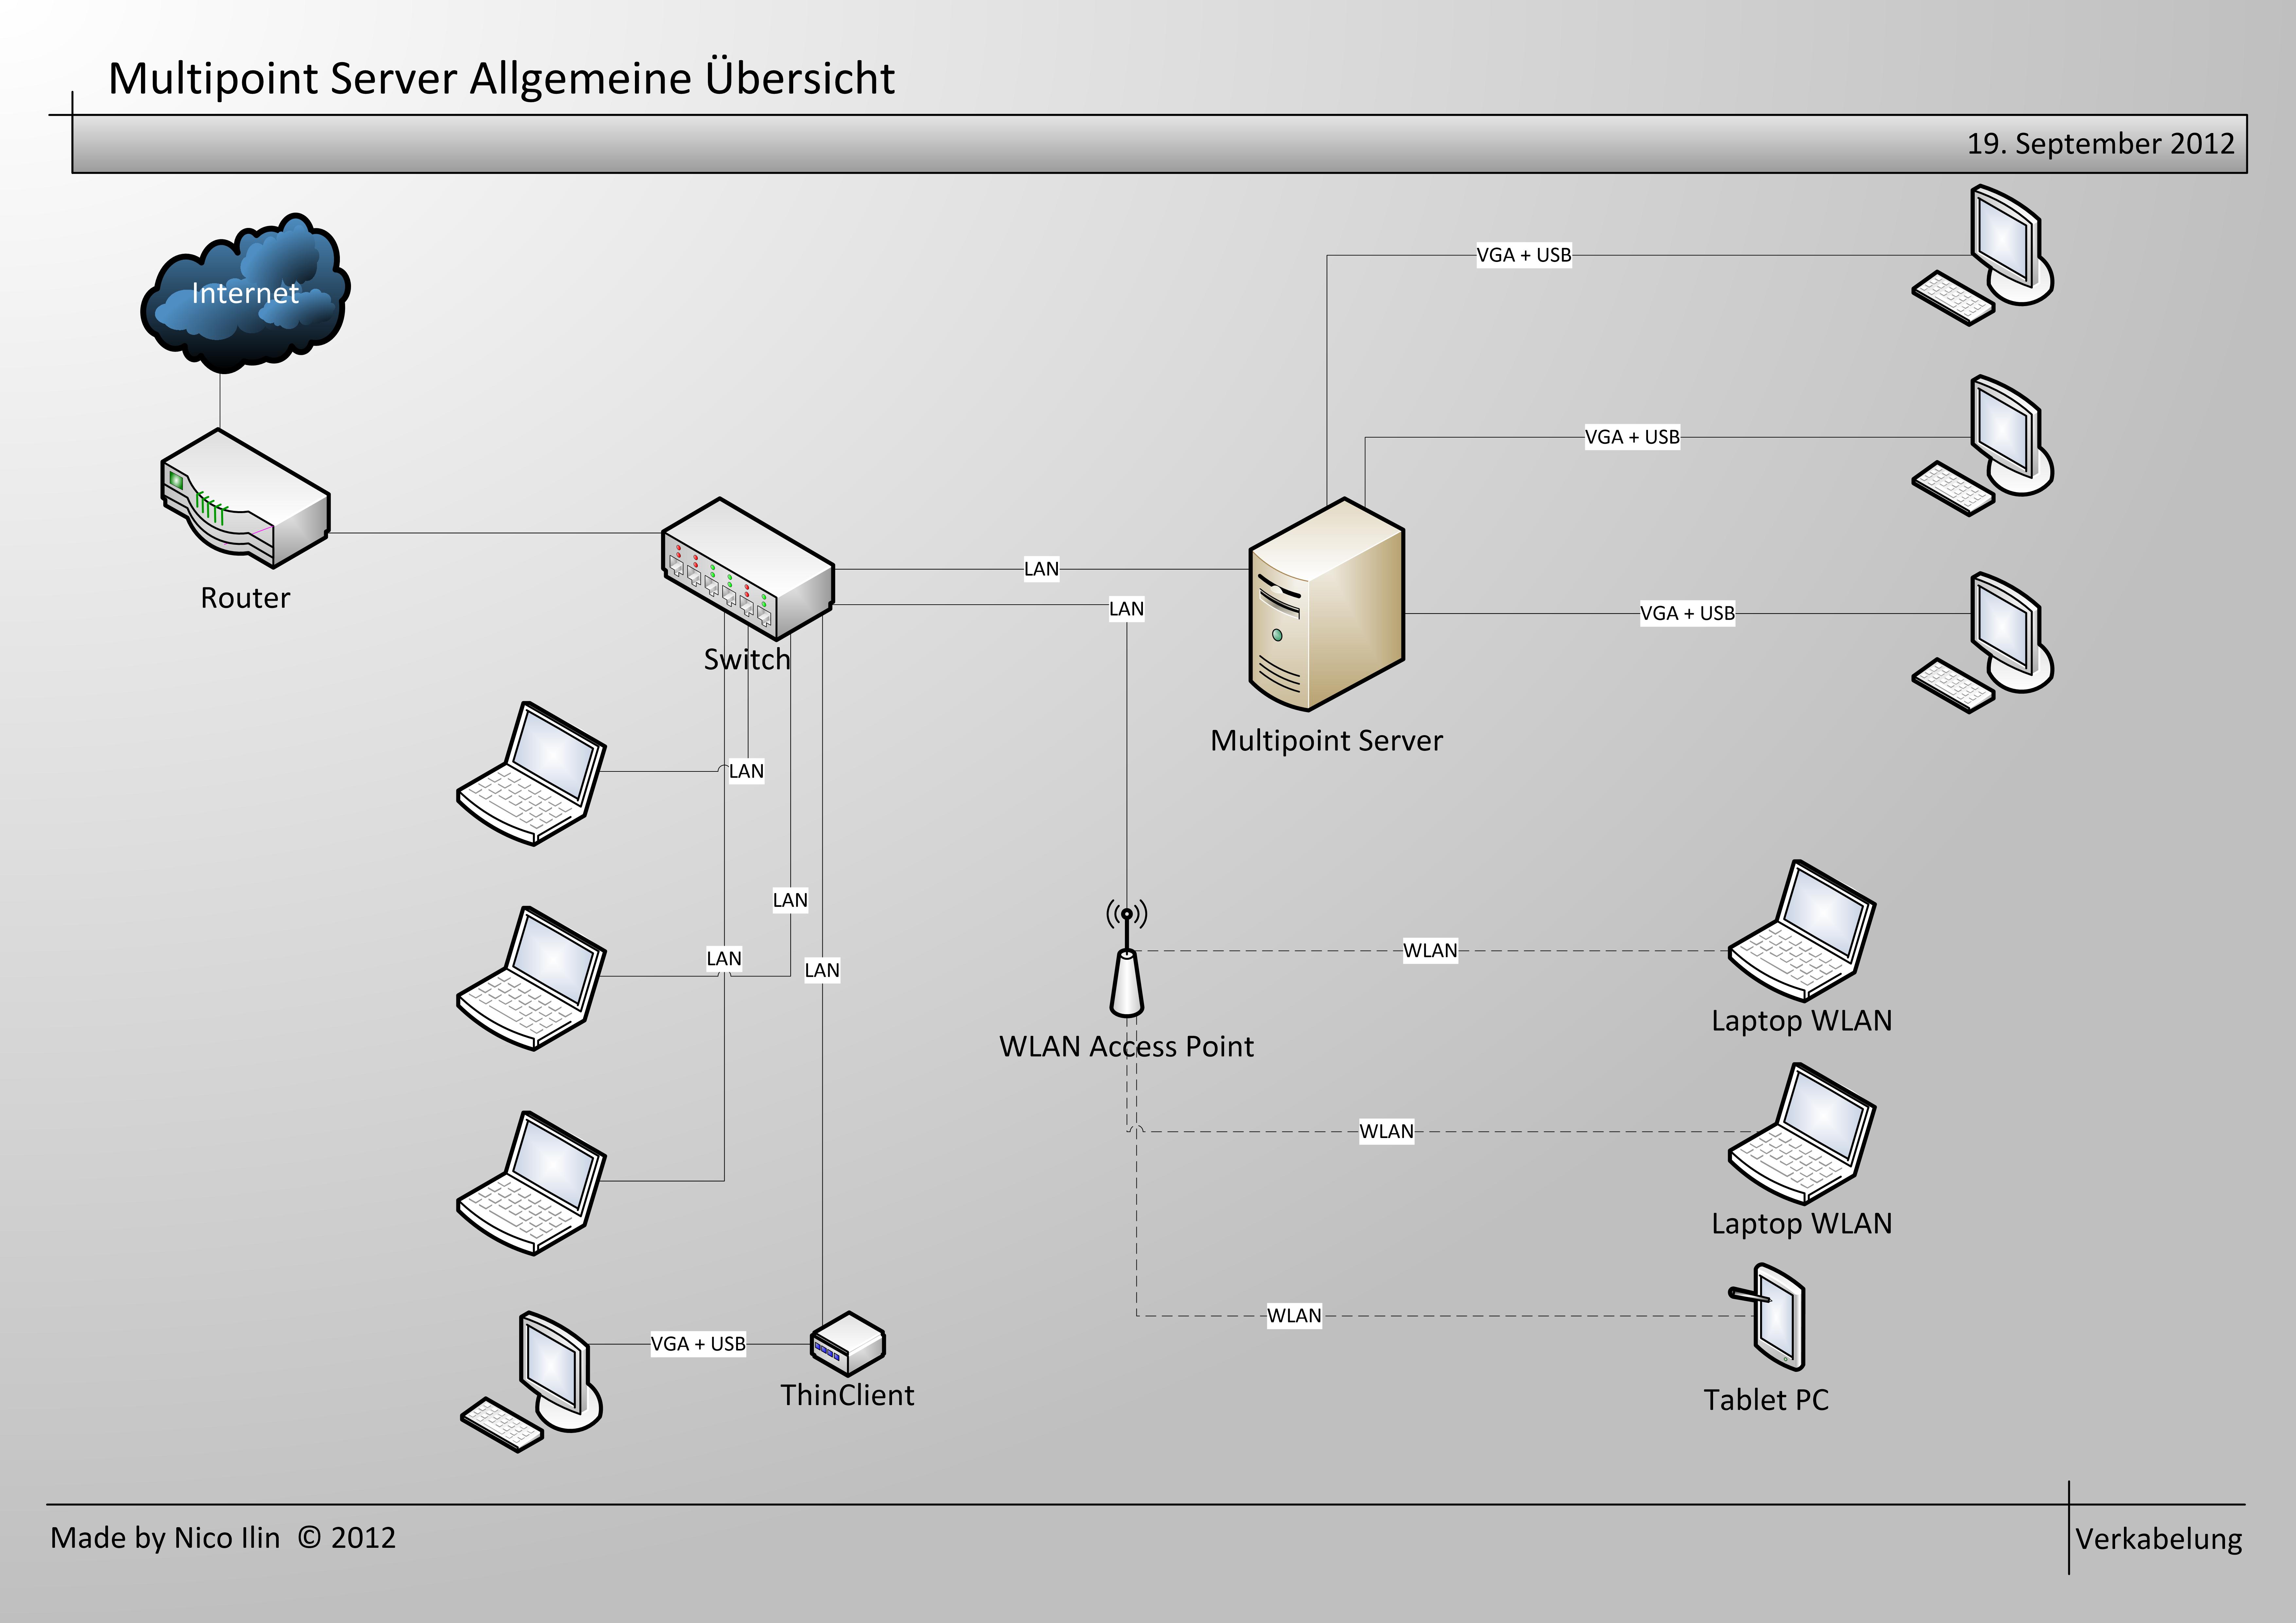 Multipoint Server Allgemeine Verkabelung